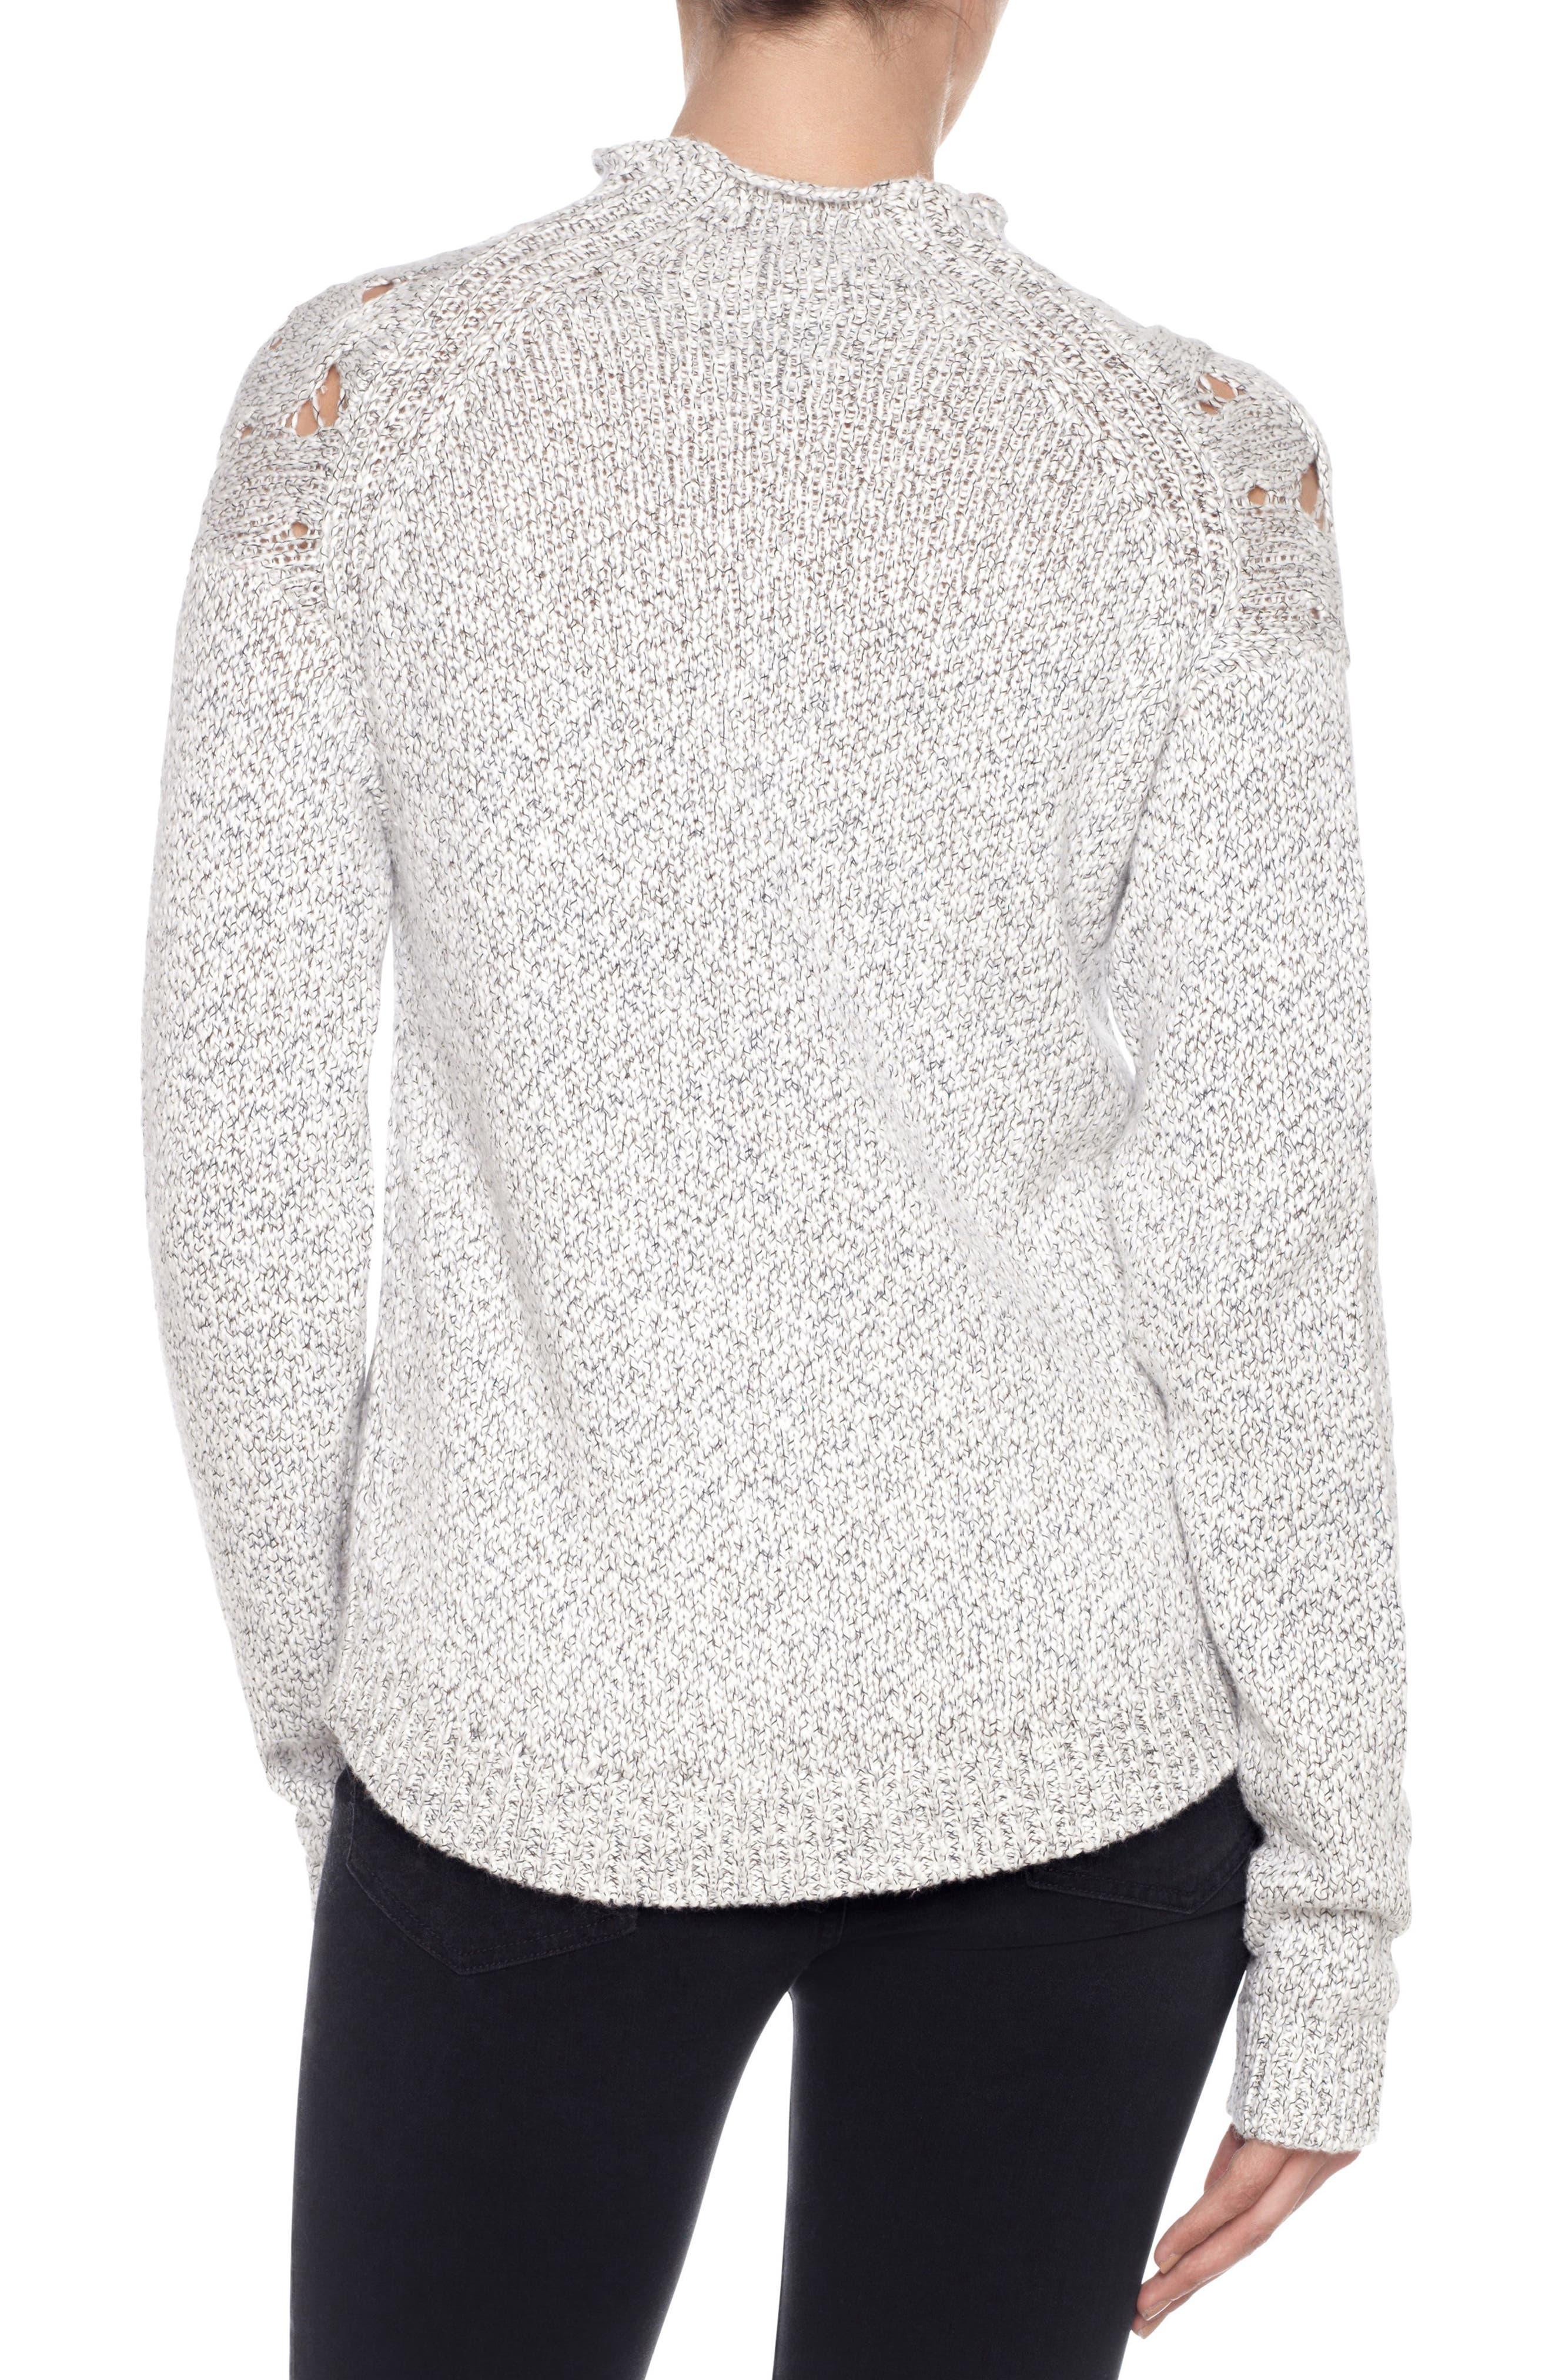 Aubree Roll Neck Sweater,                             Alternate thumbnail 2, color,                             White/ Black